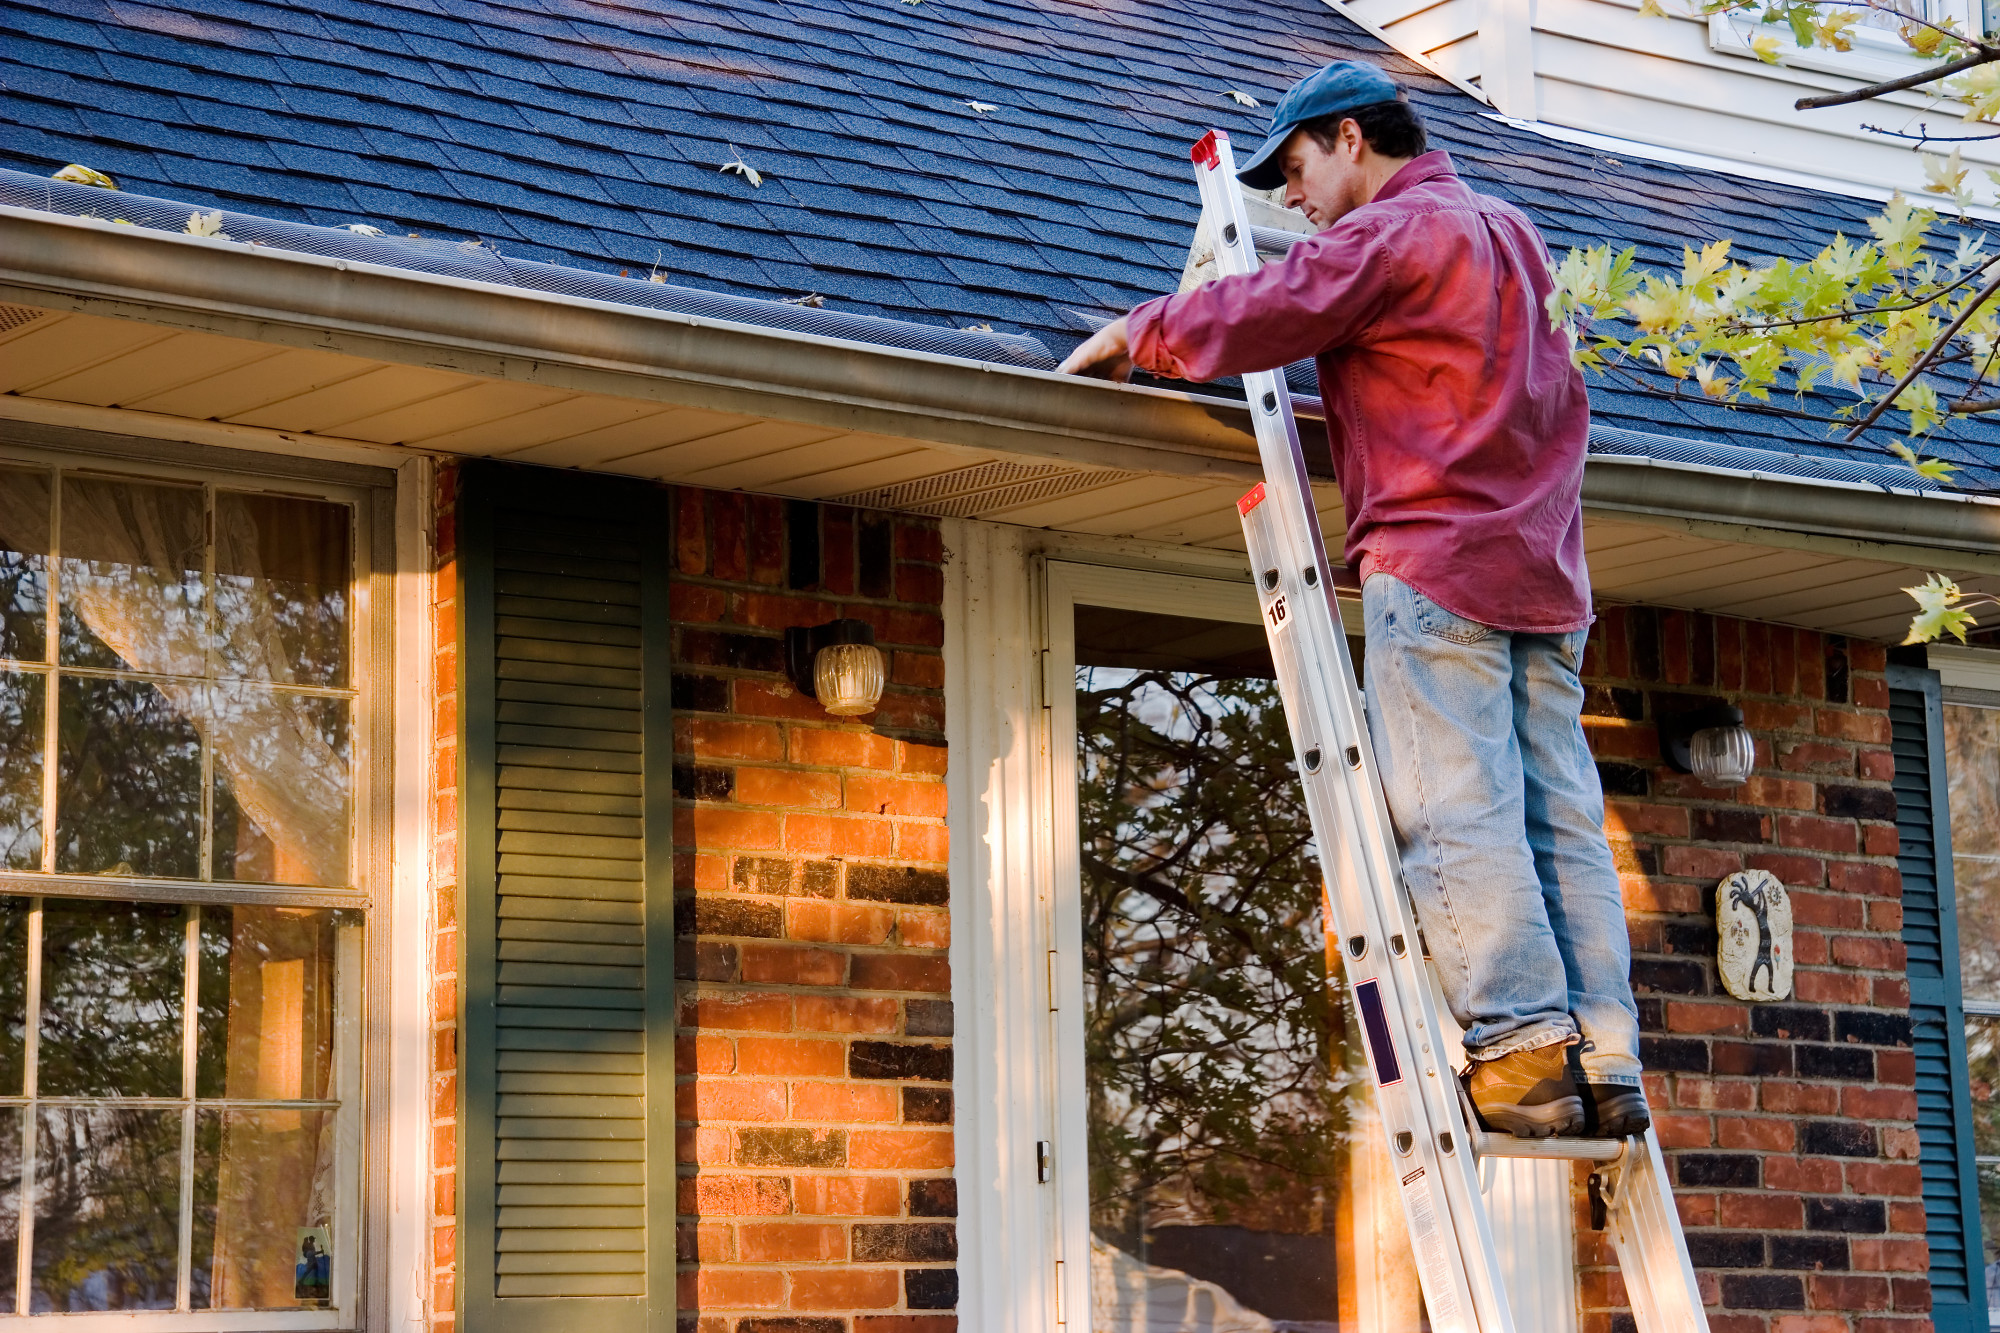 House Maintenance Checklist: Seasonal Tasks Every Homeowner Should Do